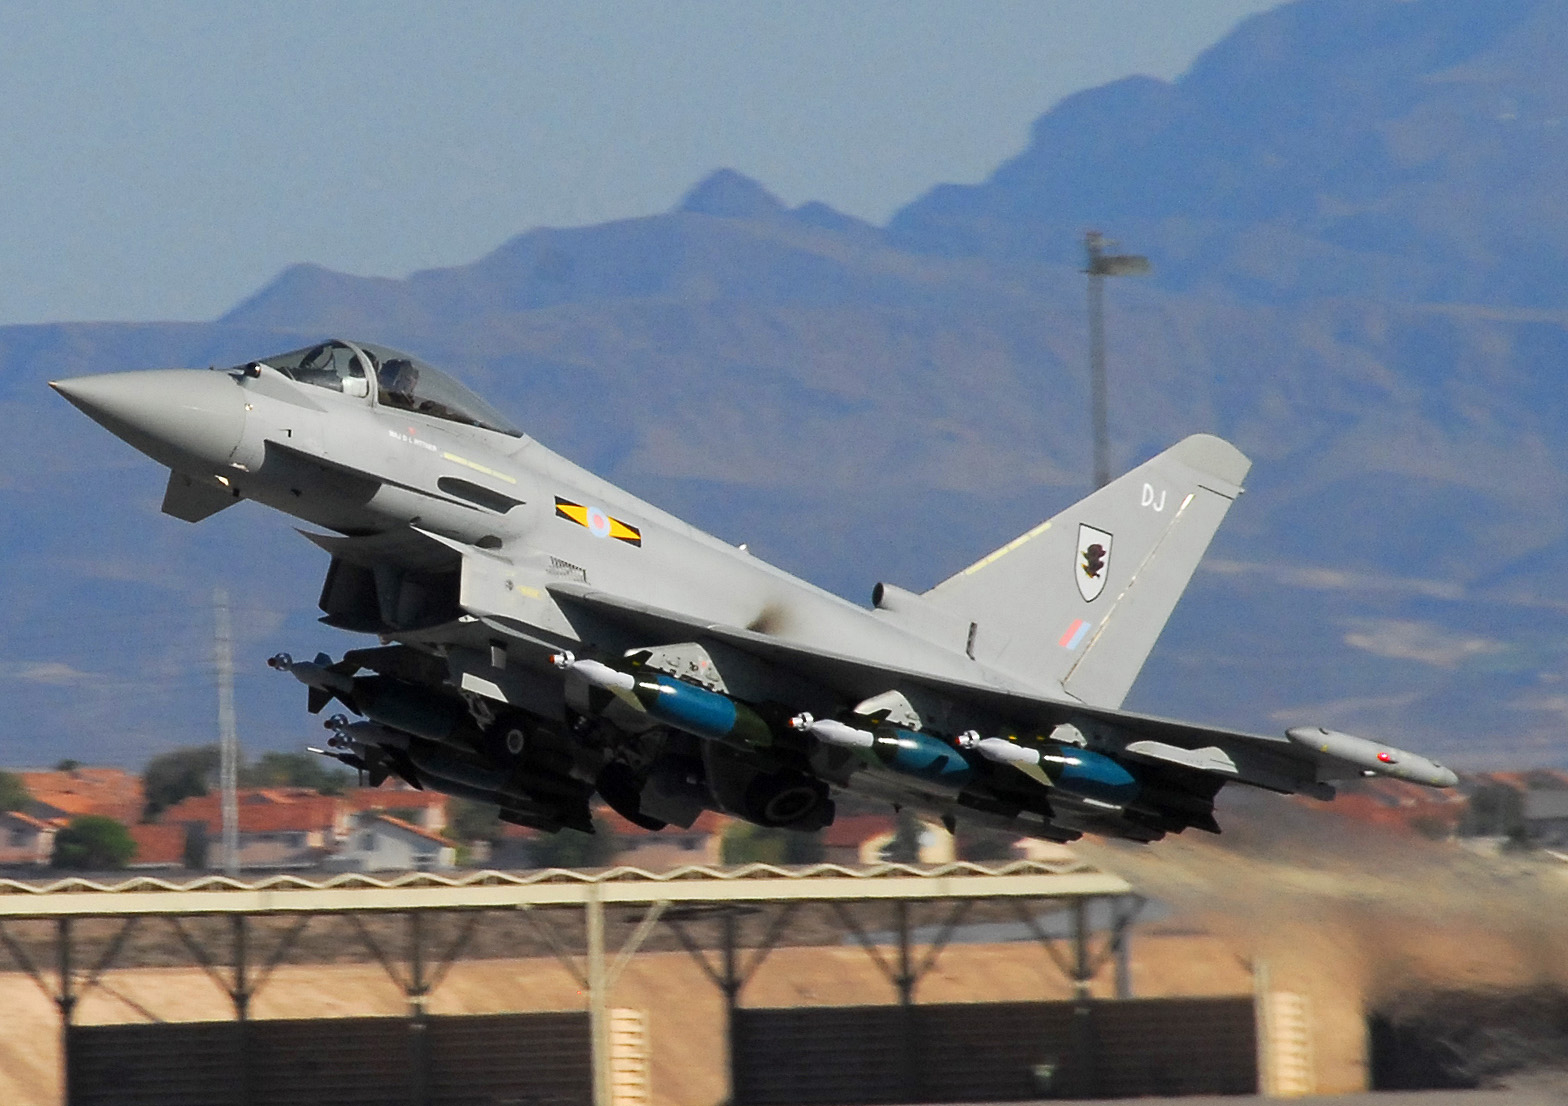 http://upload.wikimedia.org/wikipedia/commons/6/69/Eurofighter-NellisAFB-2008.jpg